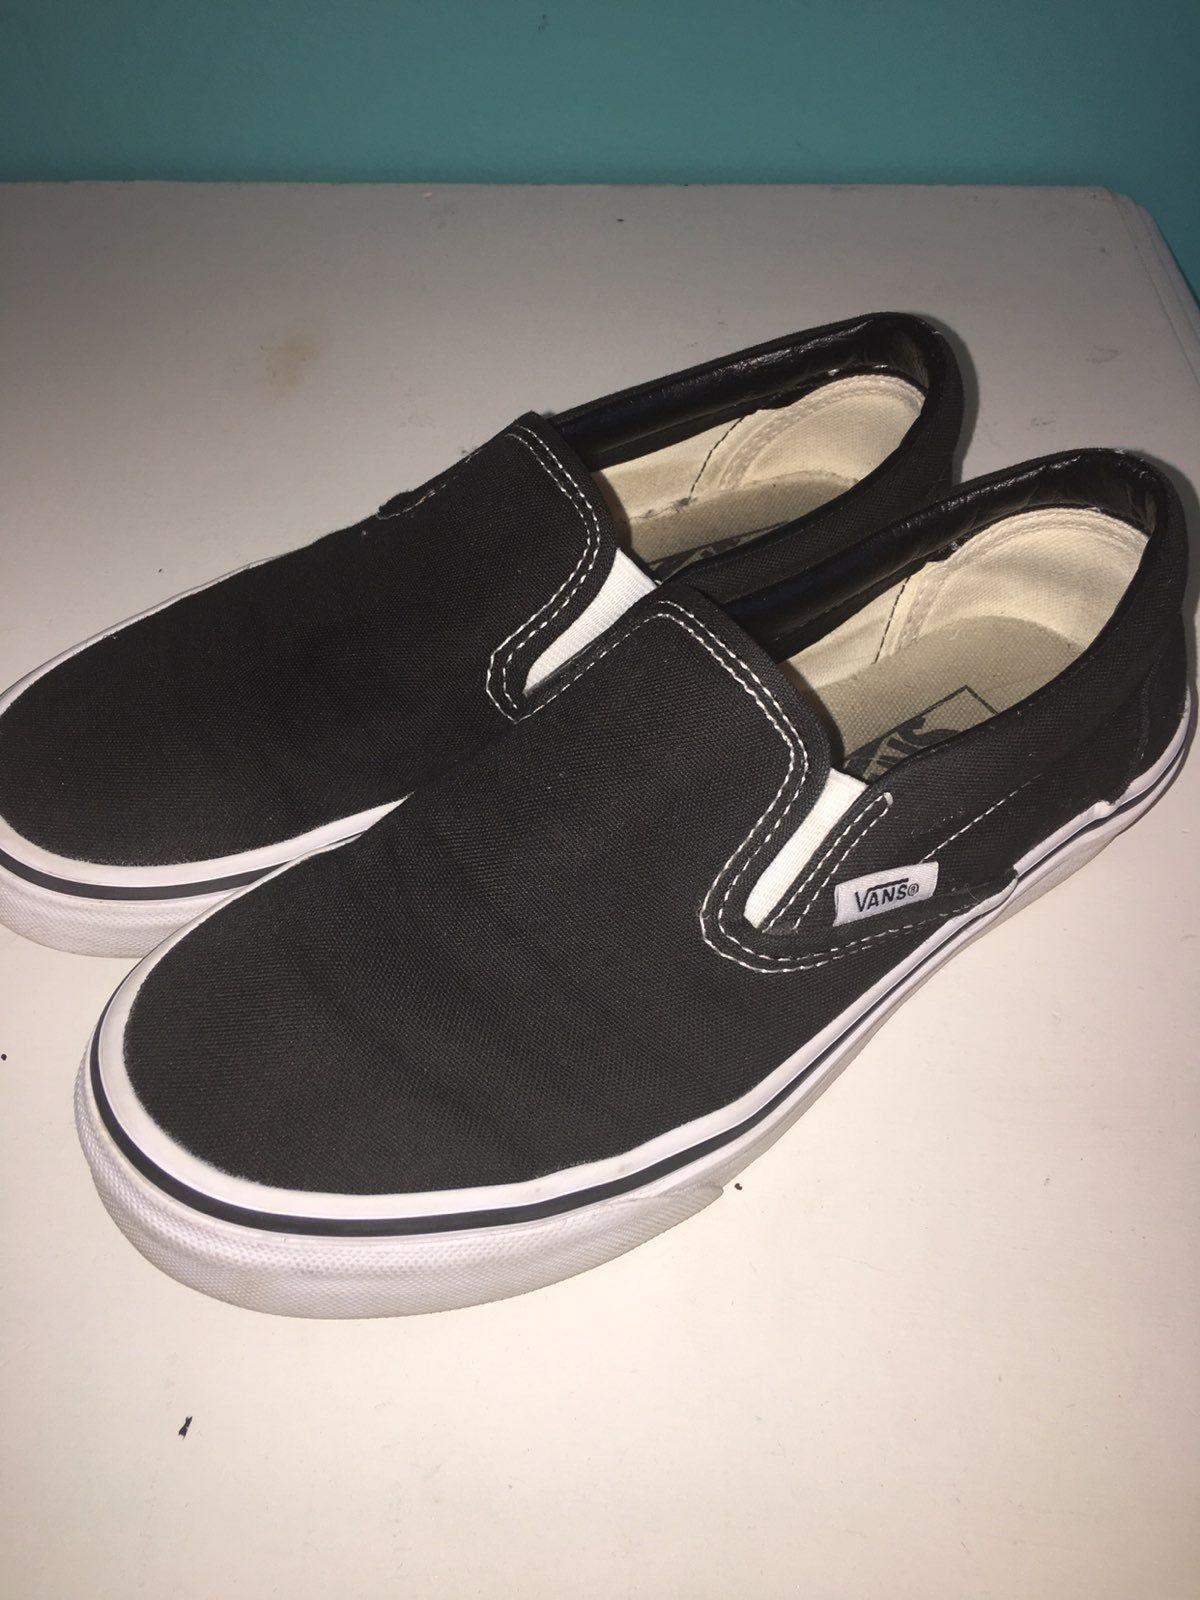 Vans, Slip on sneaker, Black slip ons